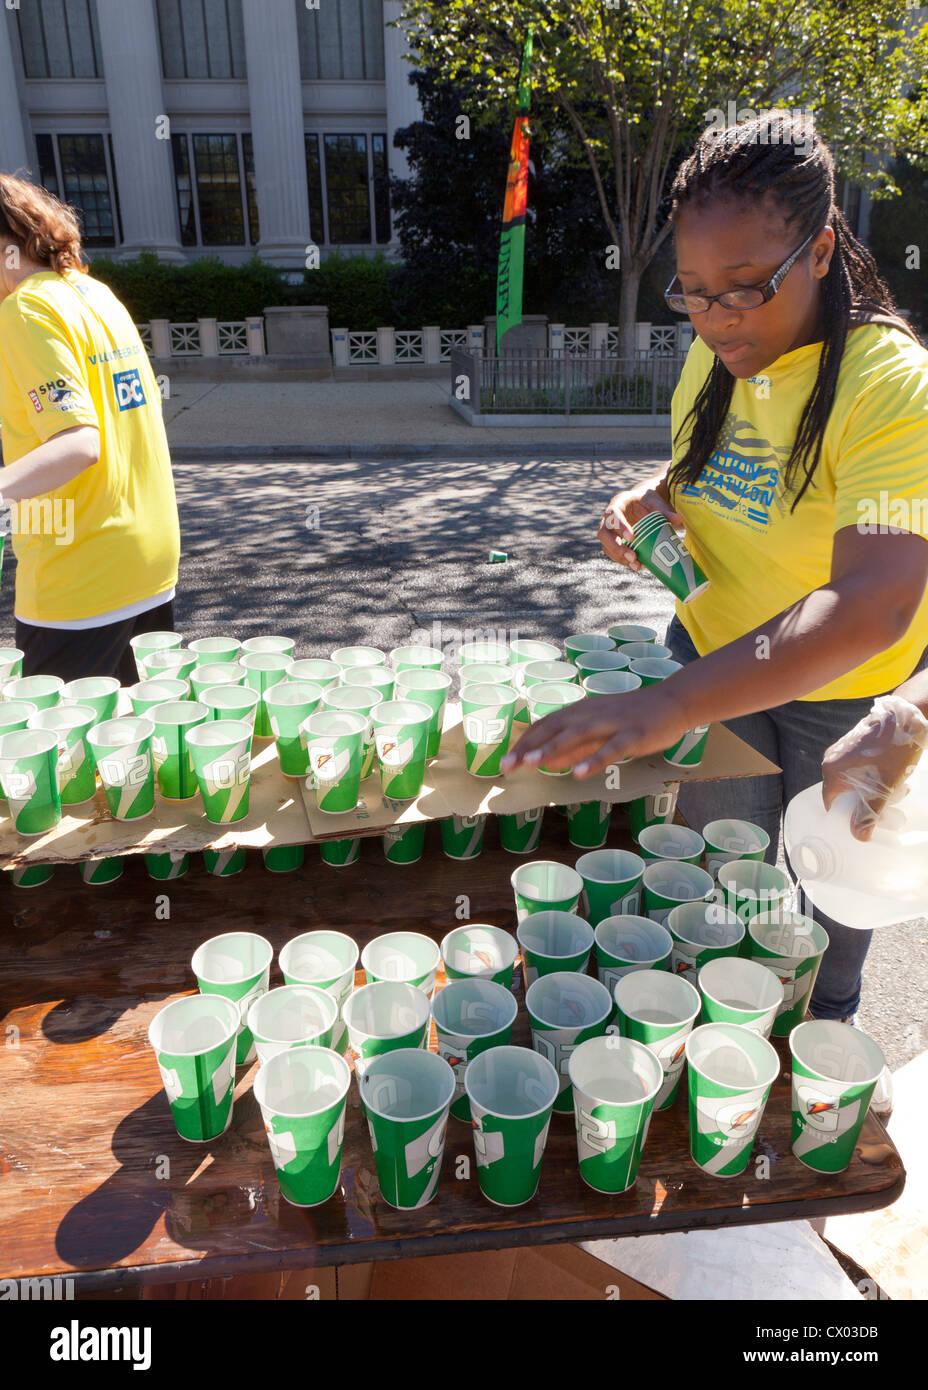 Volunteers preparing water for racers at a marathon - Stock Image